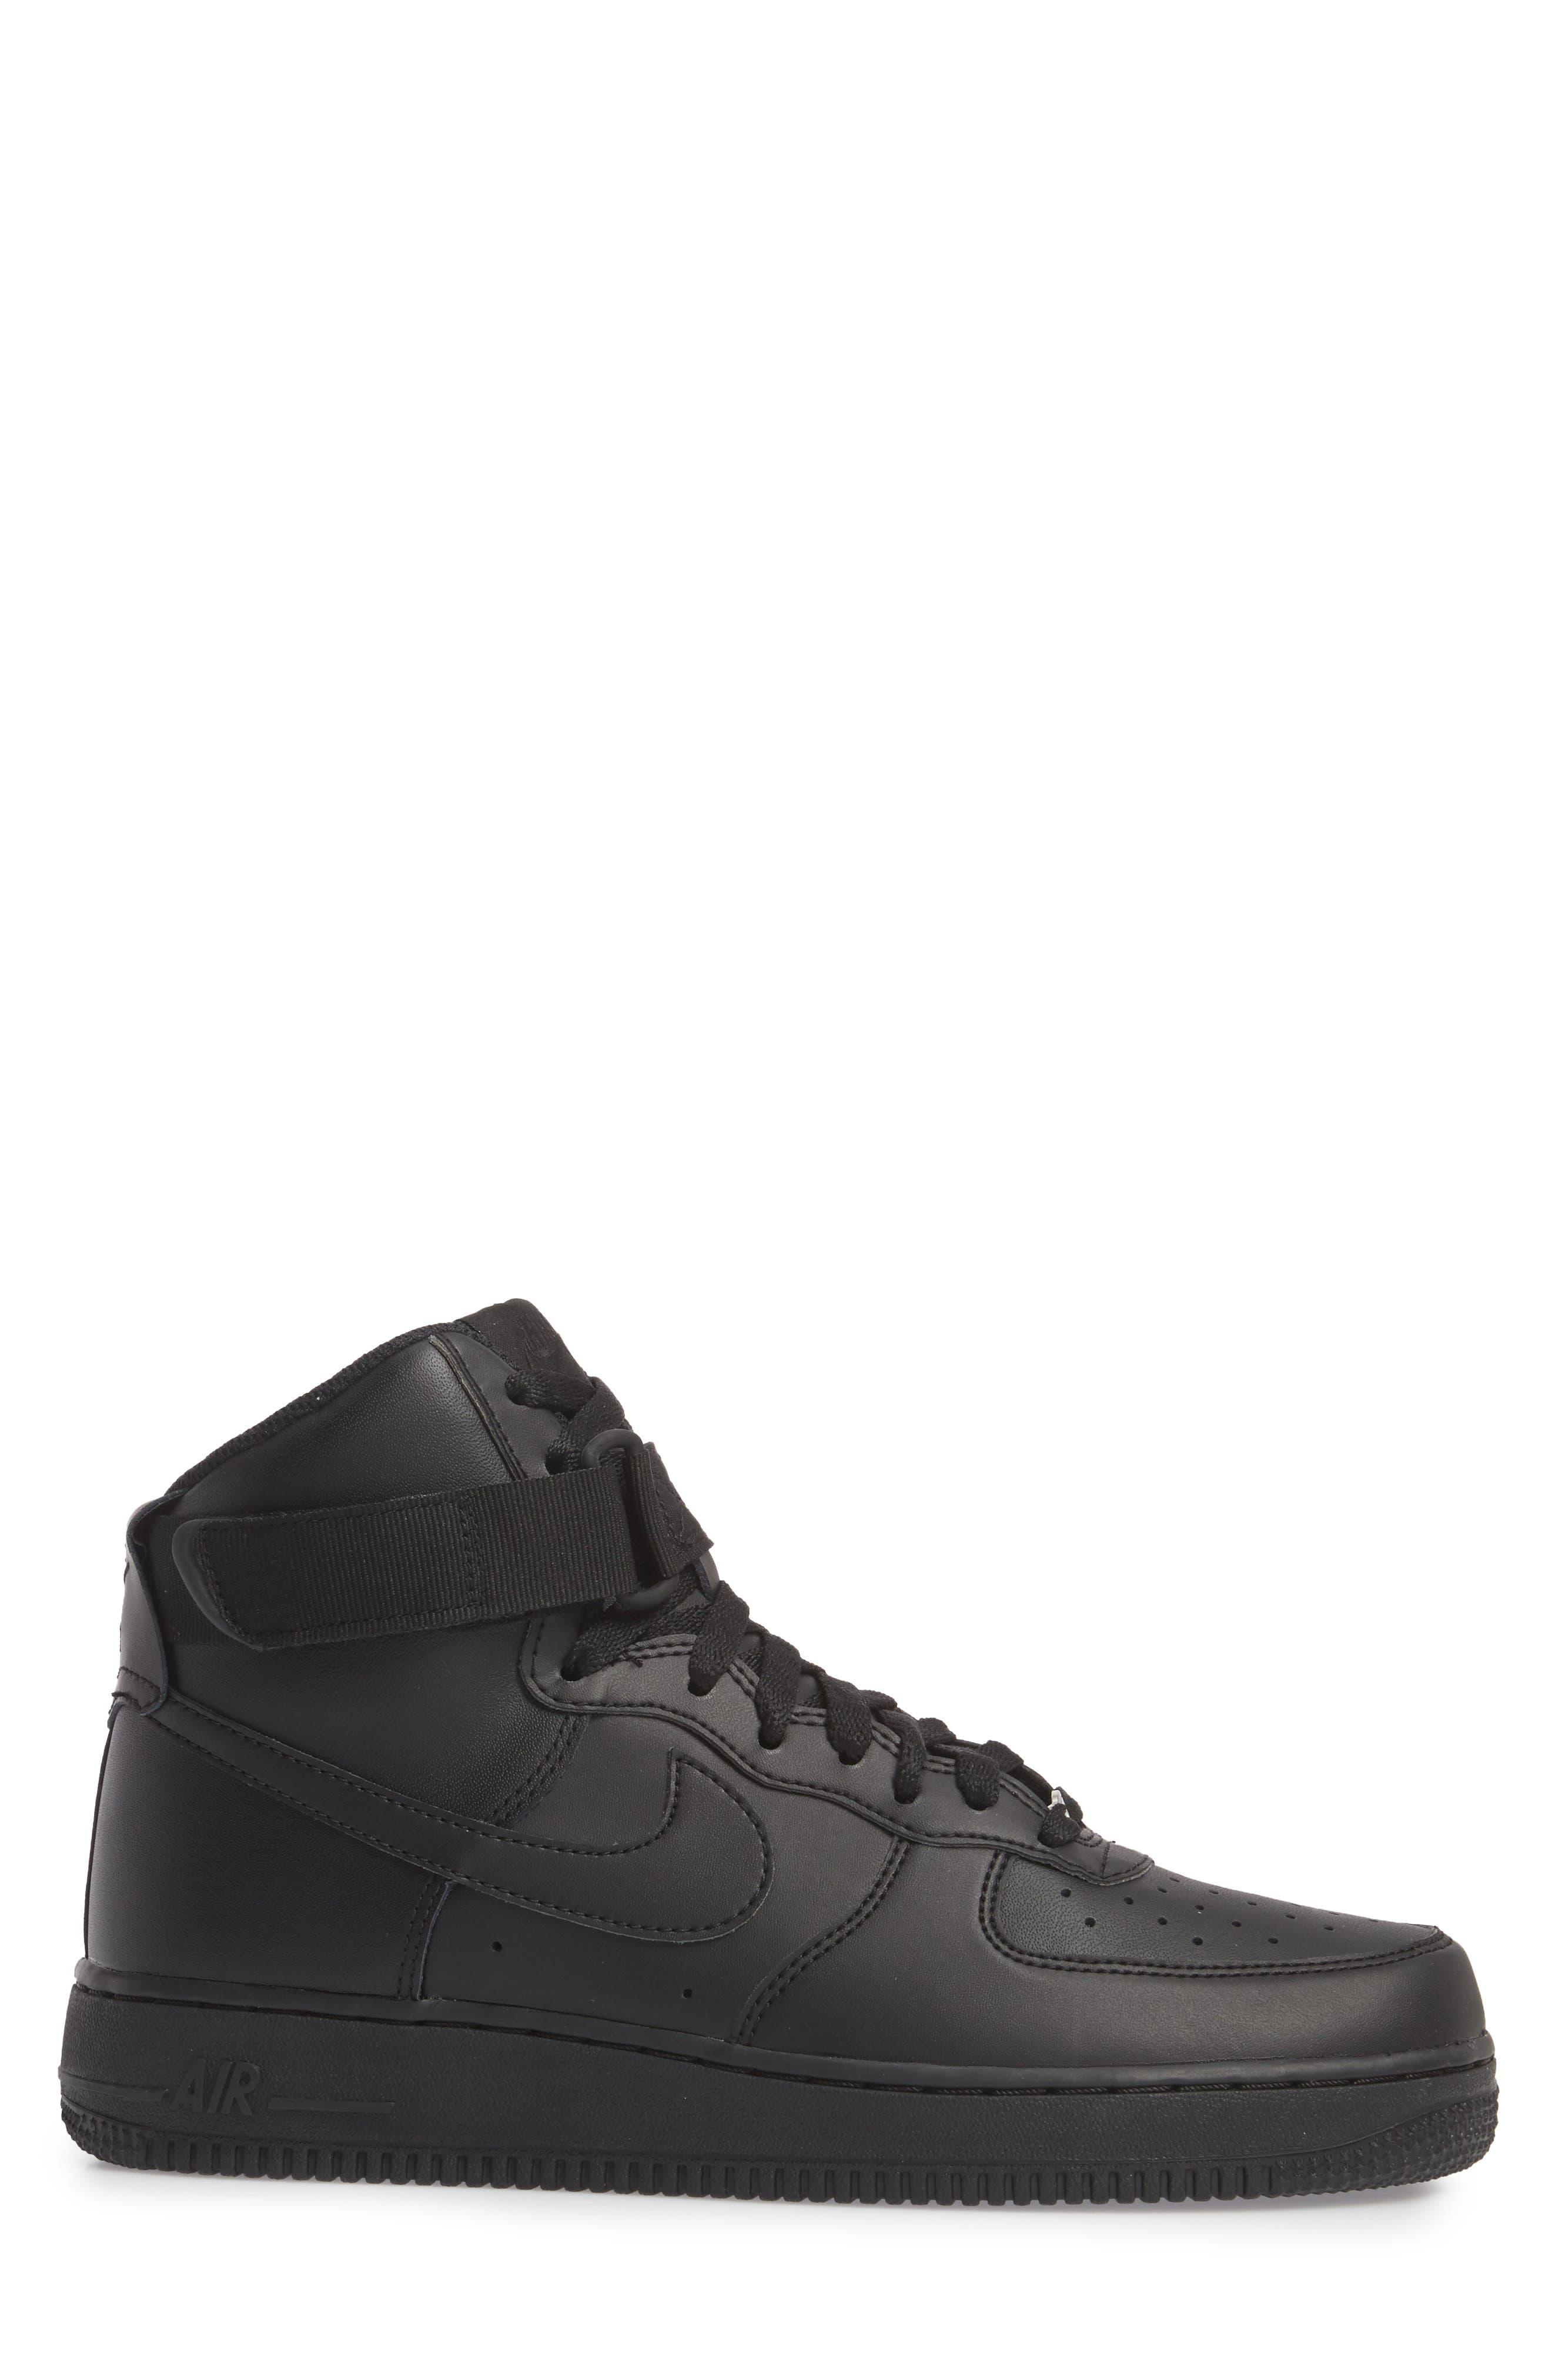 Air Force 1 High '07 Sneaker,                             Alternate thumbnail 3, color,                             Black/ Black